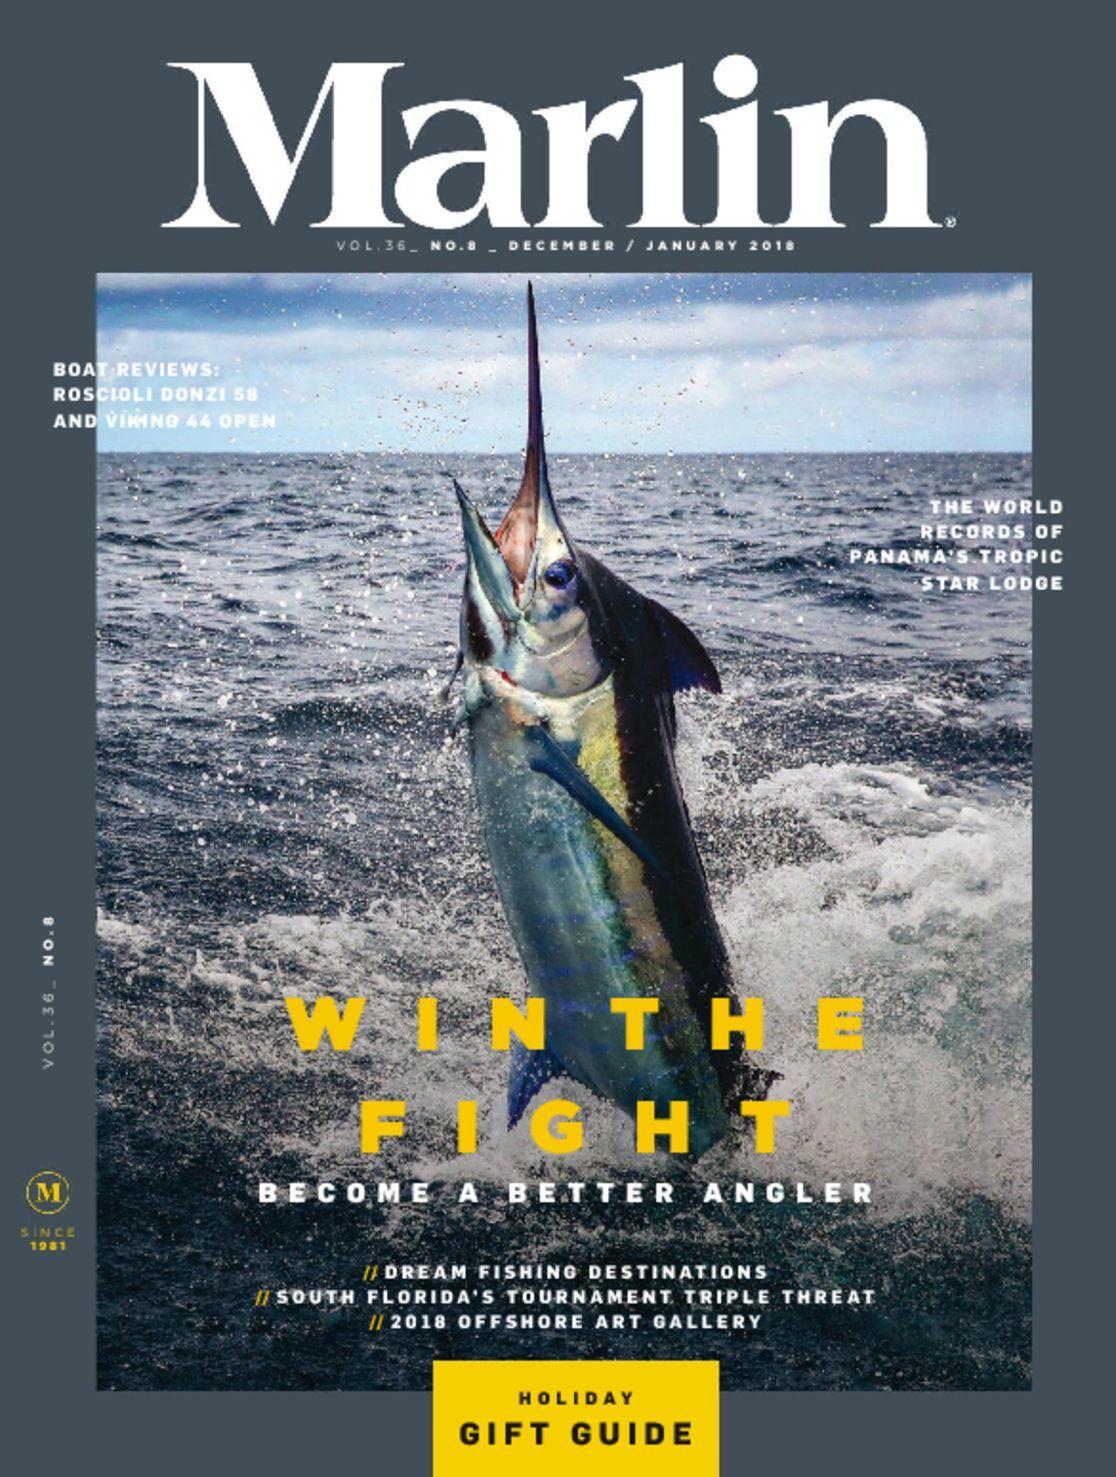 Marlin Digital Magazine Subscription